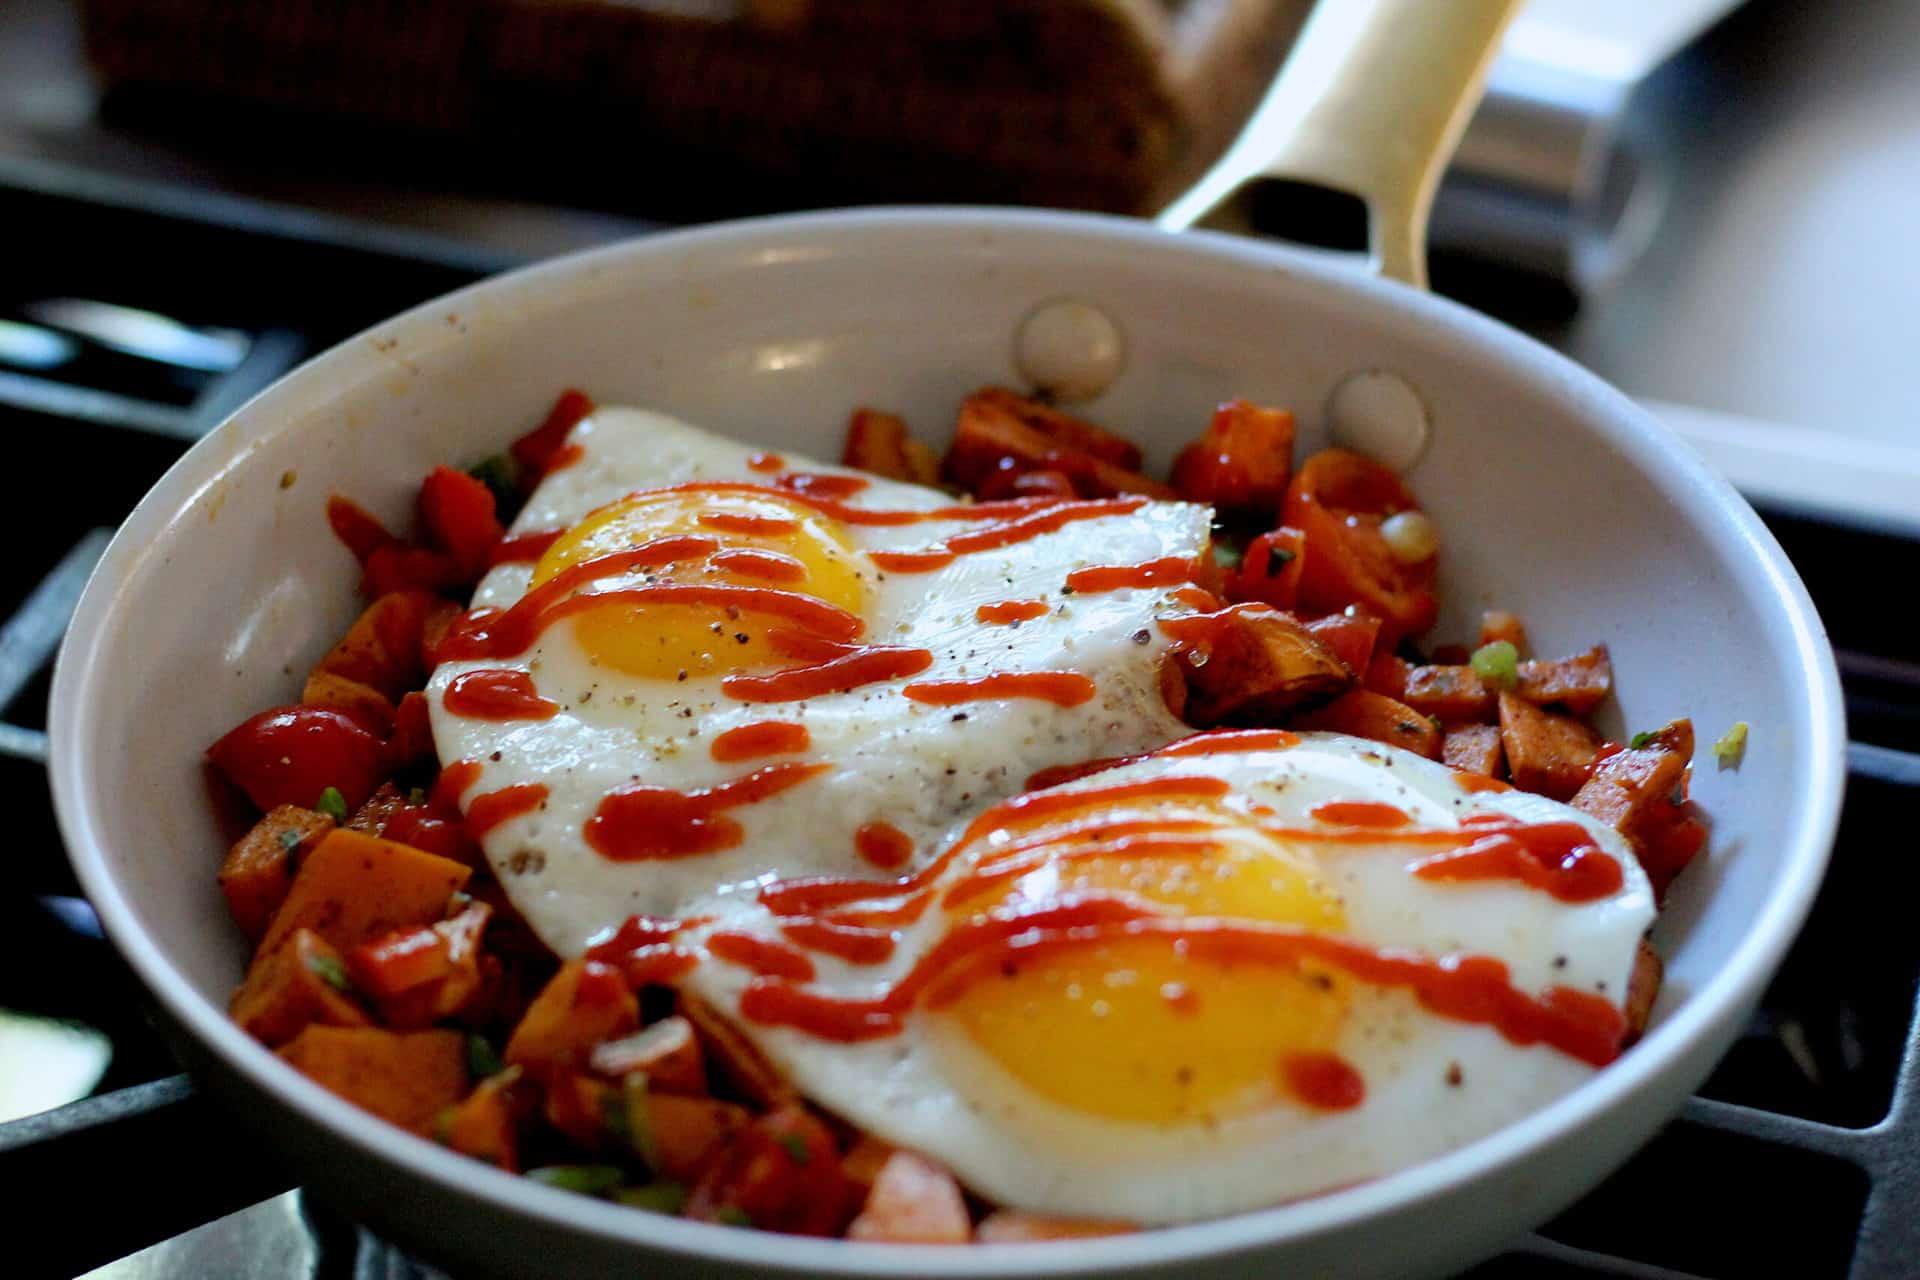 Breakfast, Eggs, Sweet Potato, Quick & easy, Fall, Mediterranean, Mediterranean diet